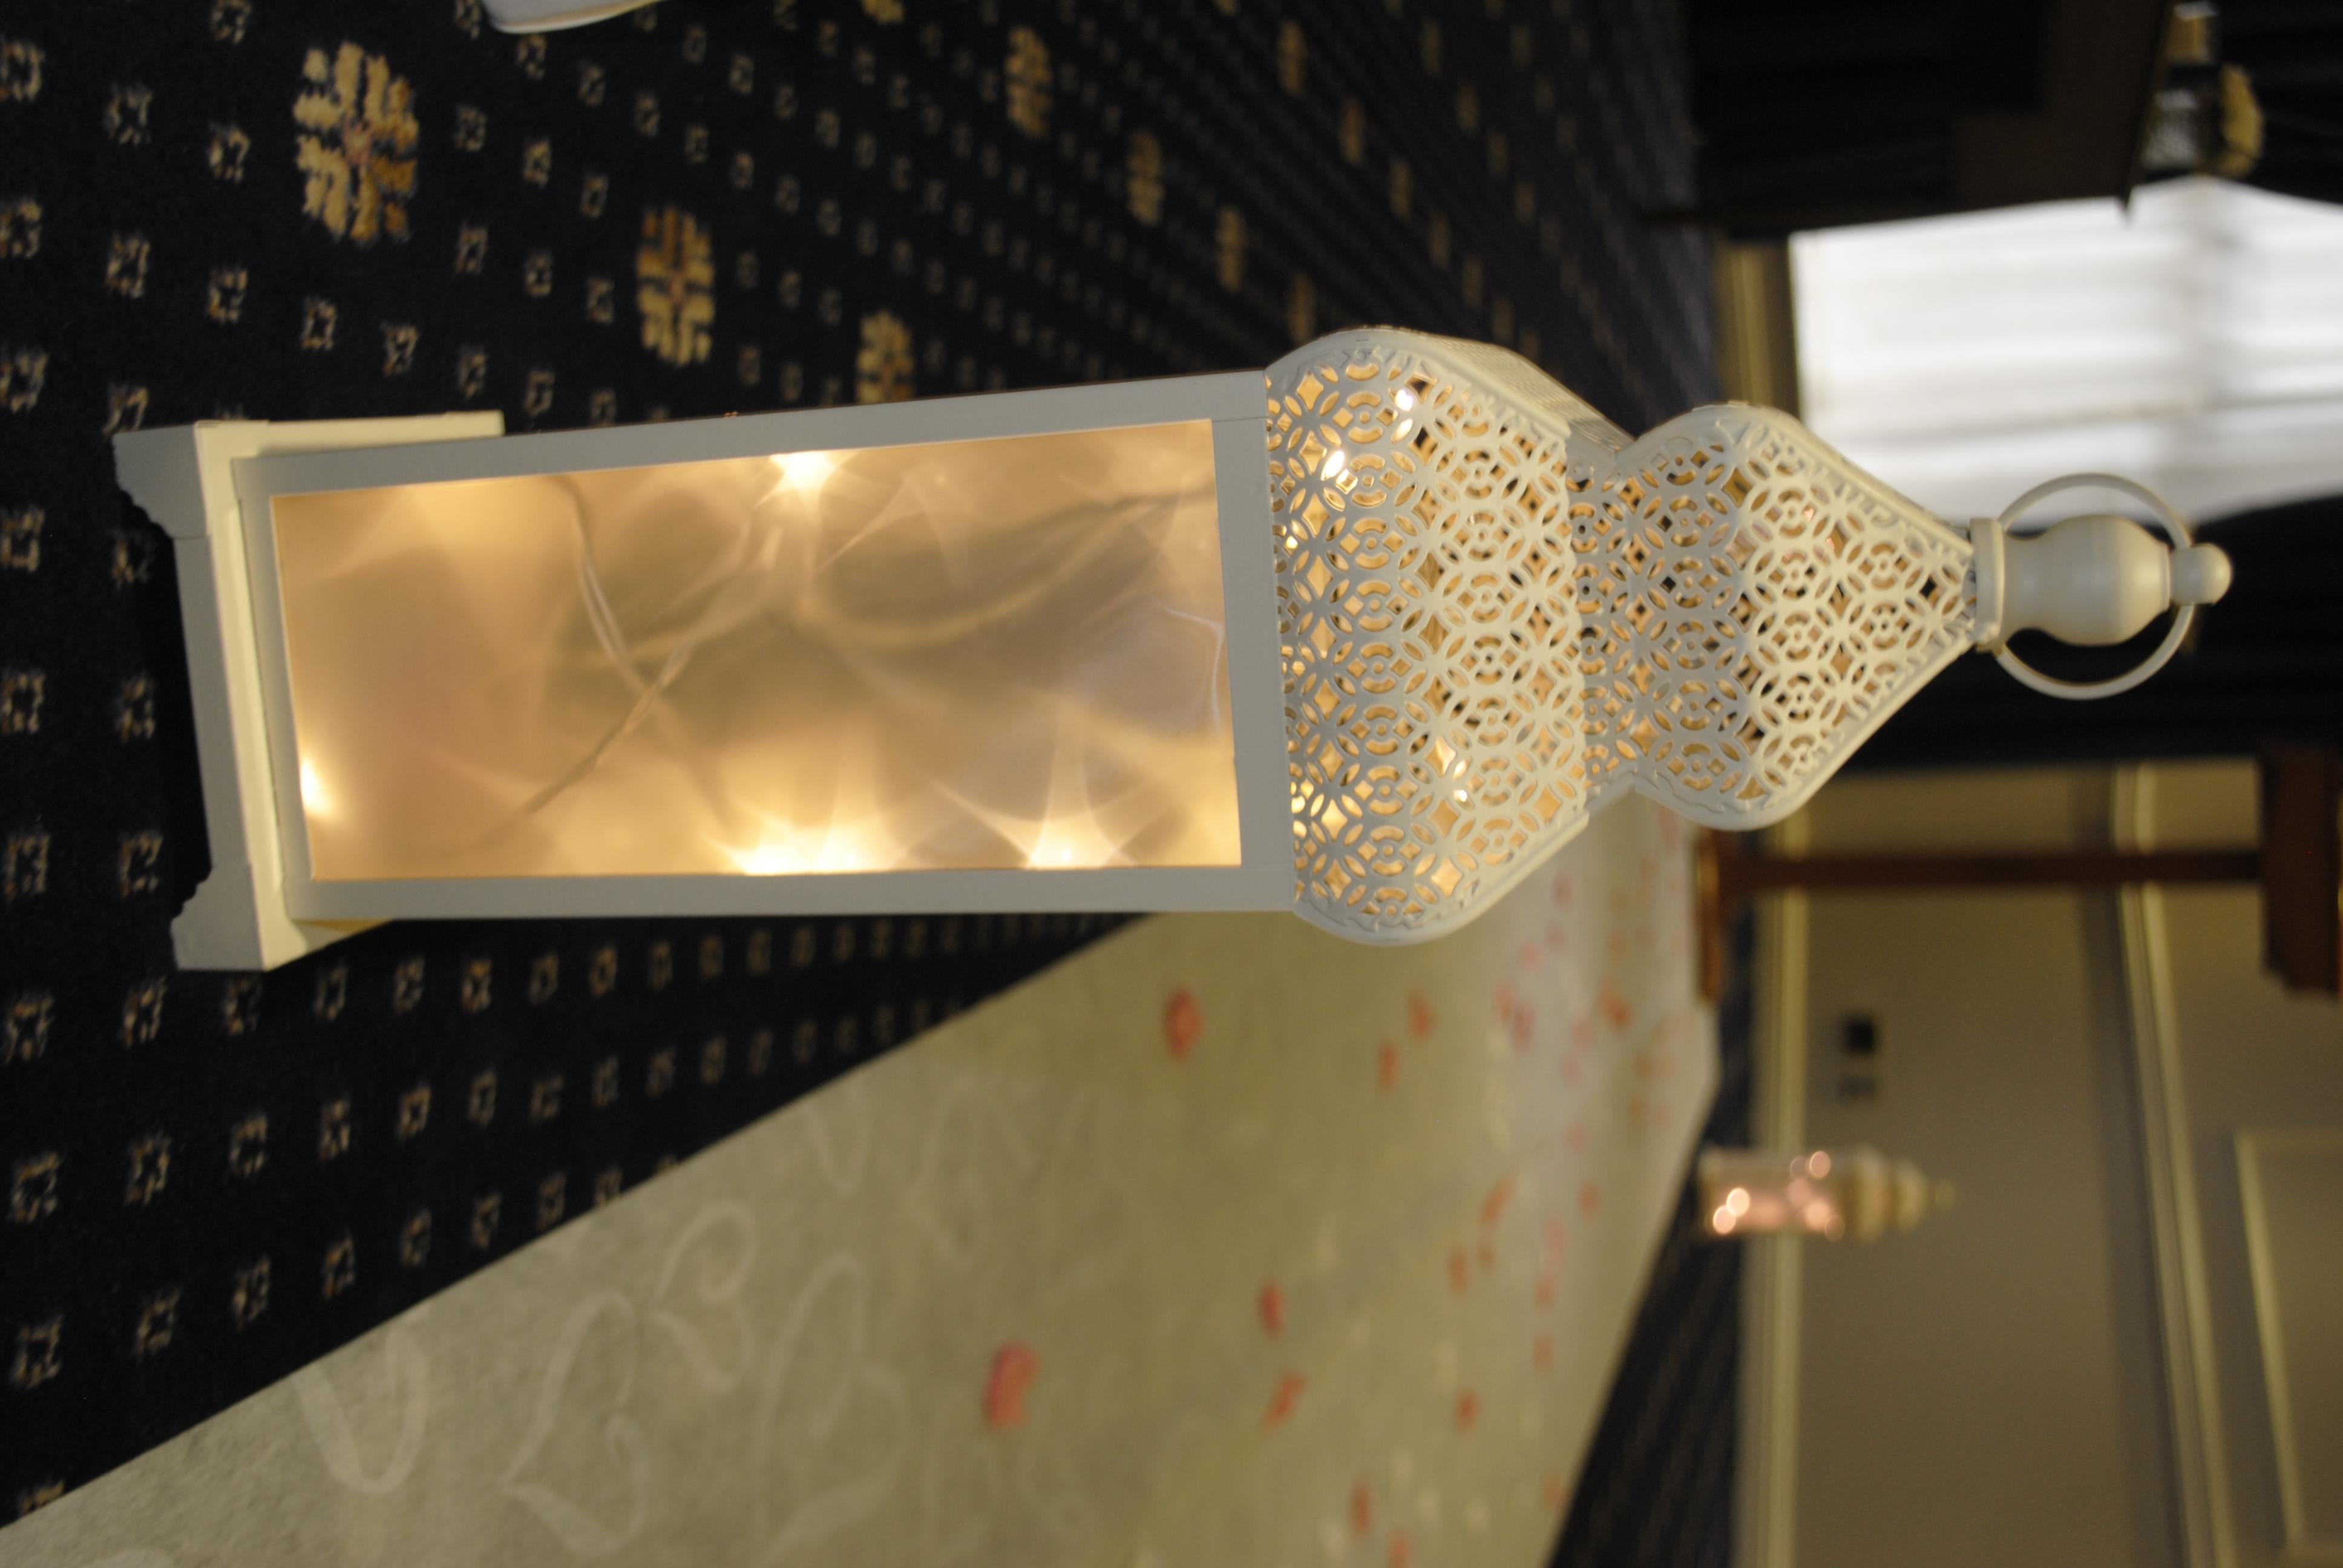 Ornate Lanterns